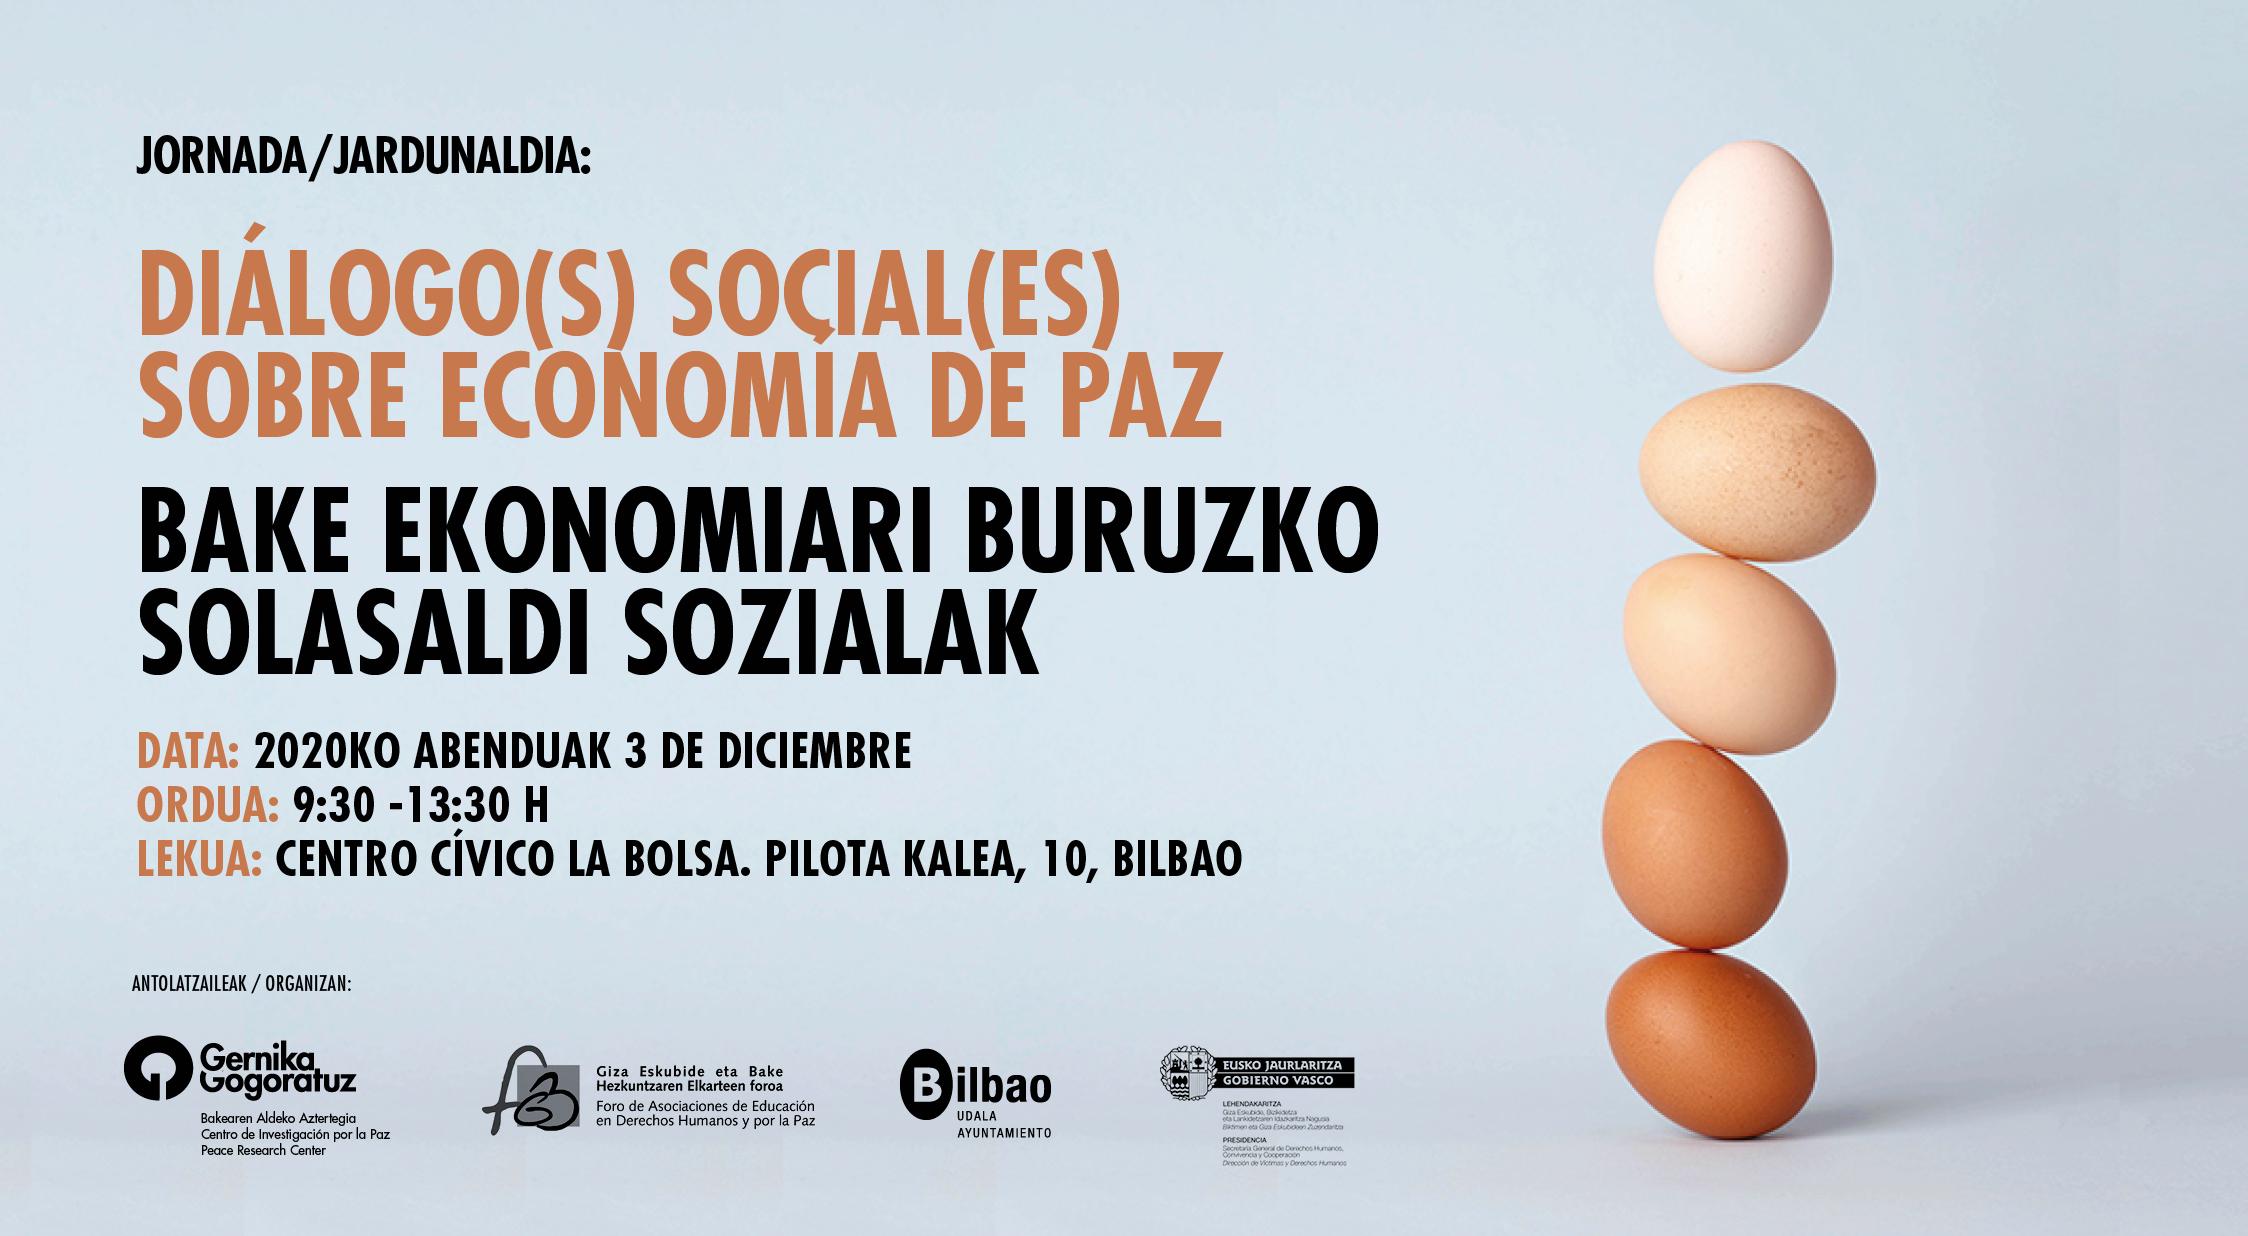 DIÁLOGO(S) SOCIAL(ES) SOBRE ECONOMÍA DE PAZ. Gernika Gogoratuz. Iñigo Retolaza